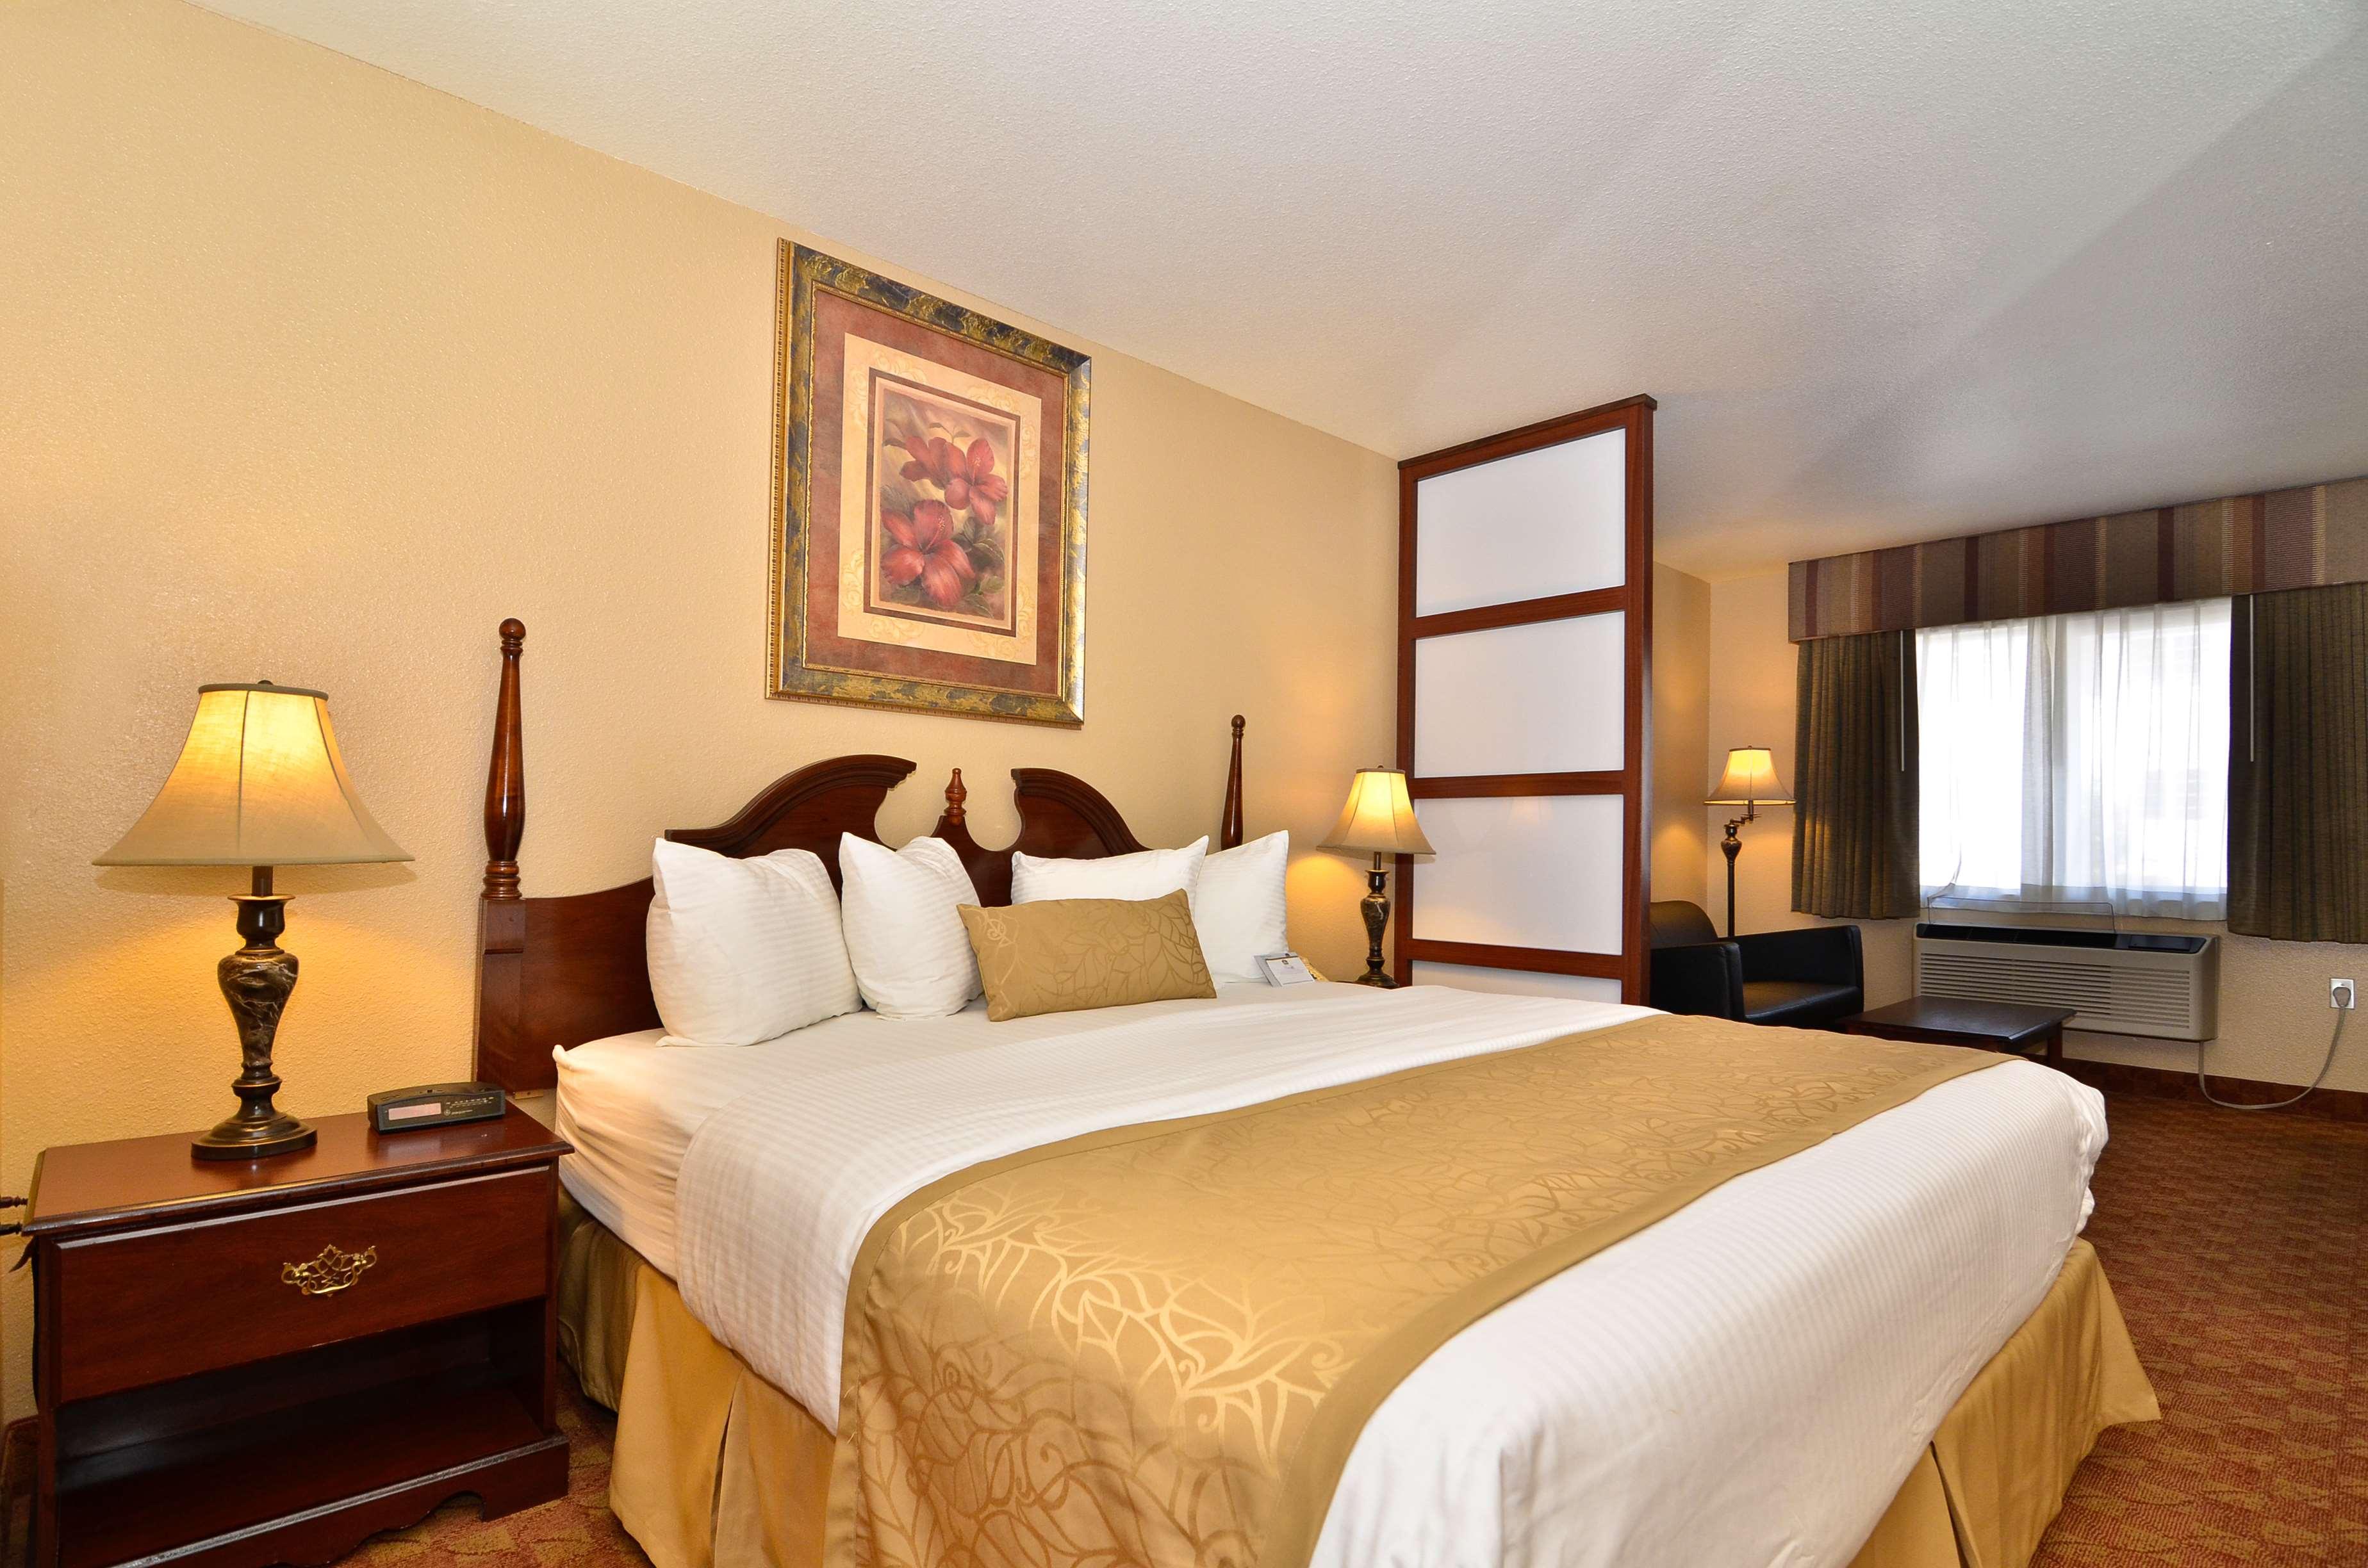 Best Western Fallon Inn & Suites image 19